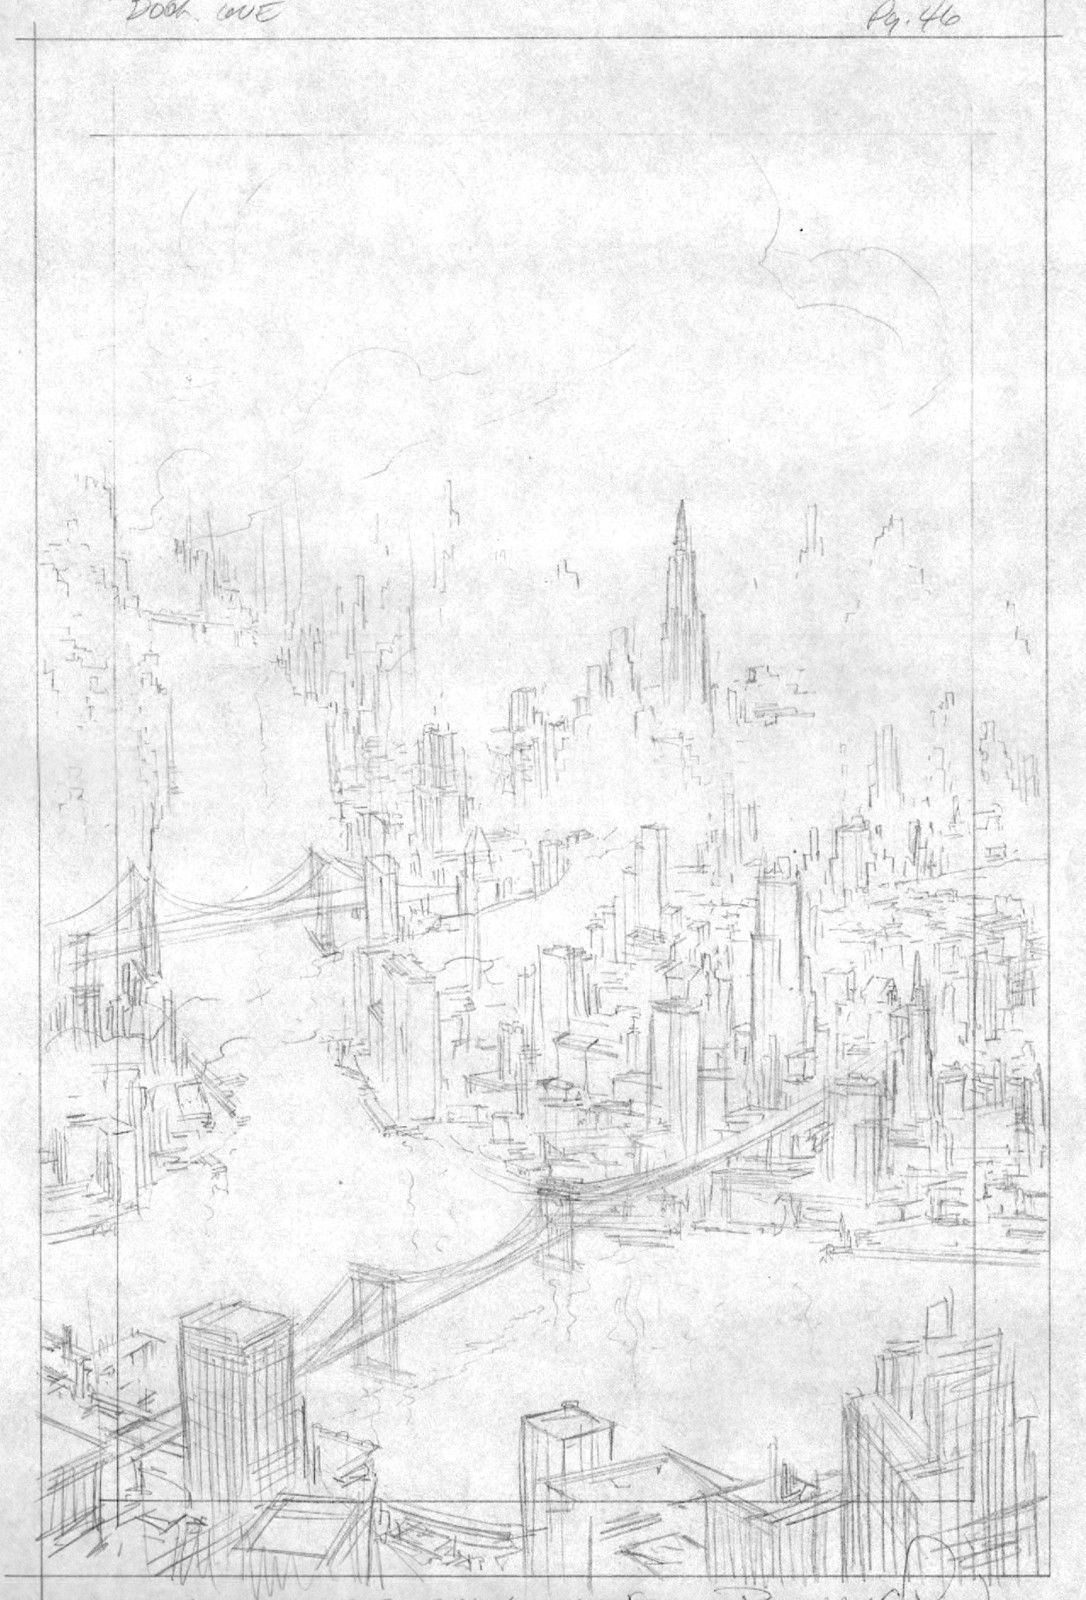 VERY RARE - BERNIE WRIGHTSON BATMAN: THE CULT ORIGINAL PENCIL ART